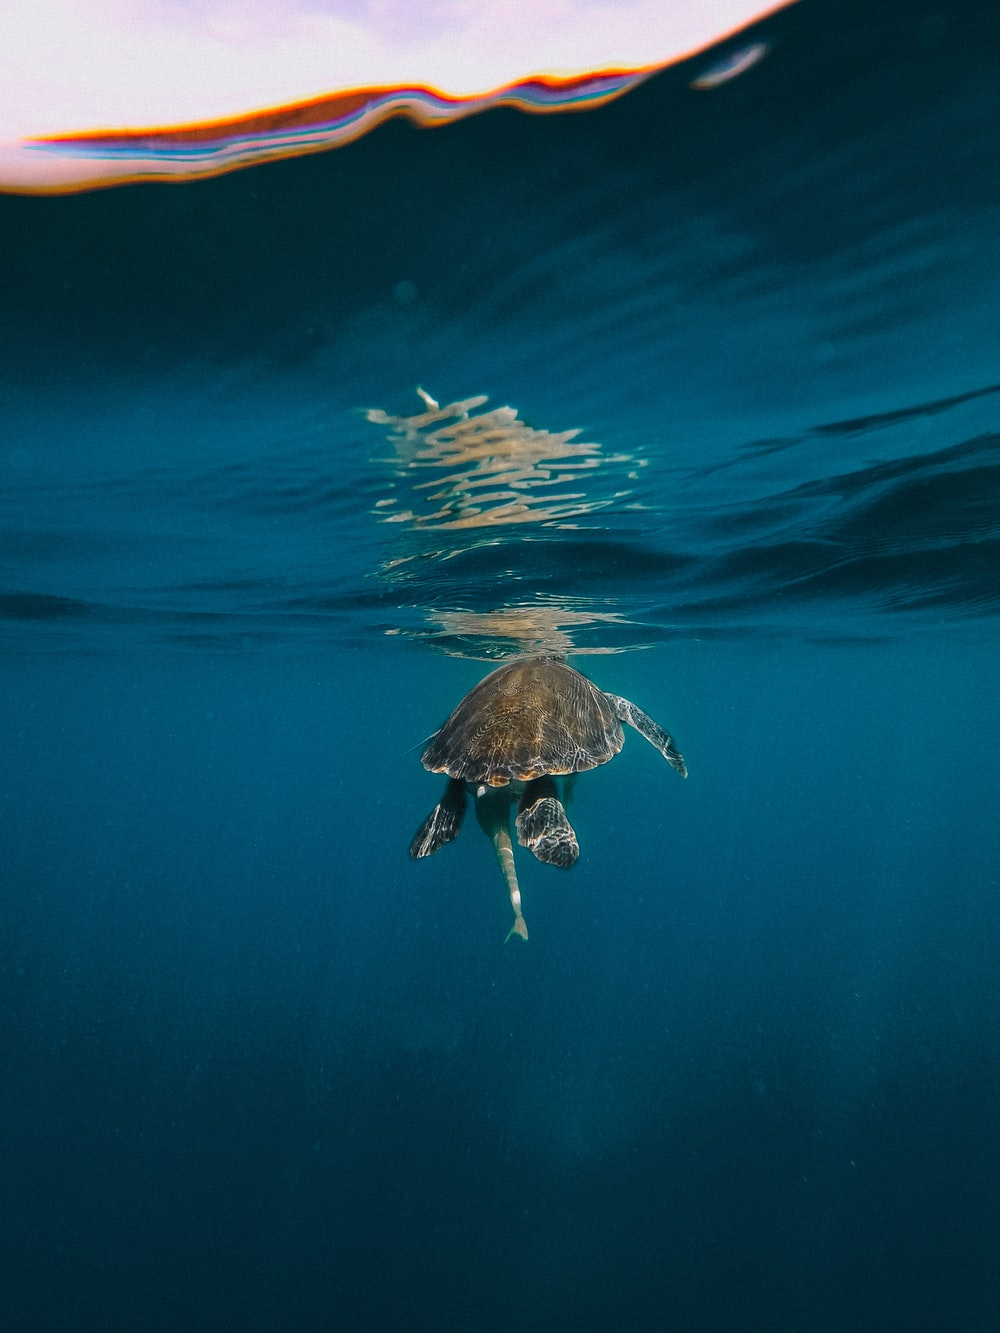 brown turtle in blue water